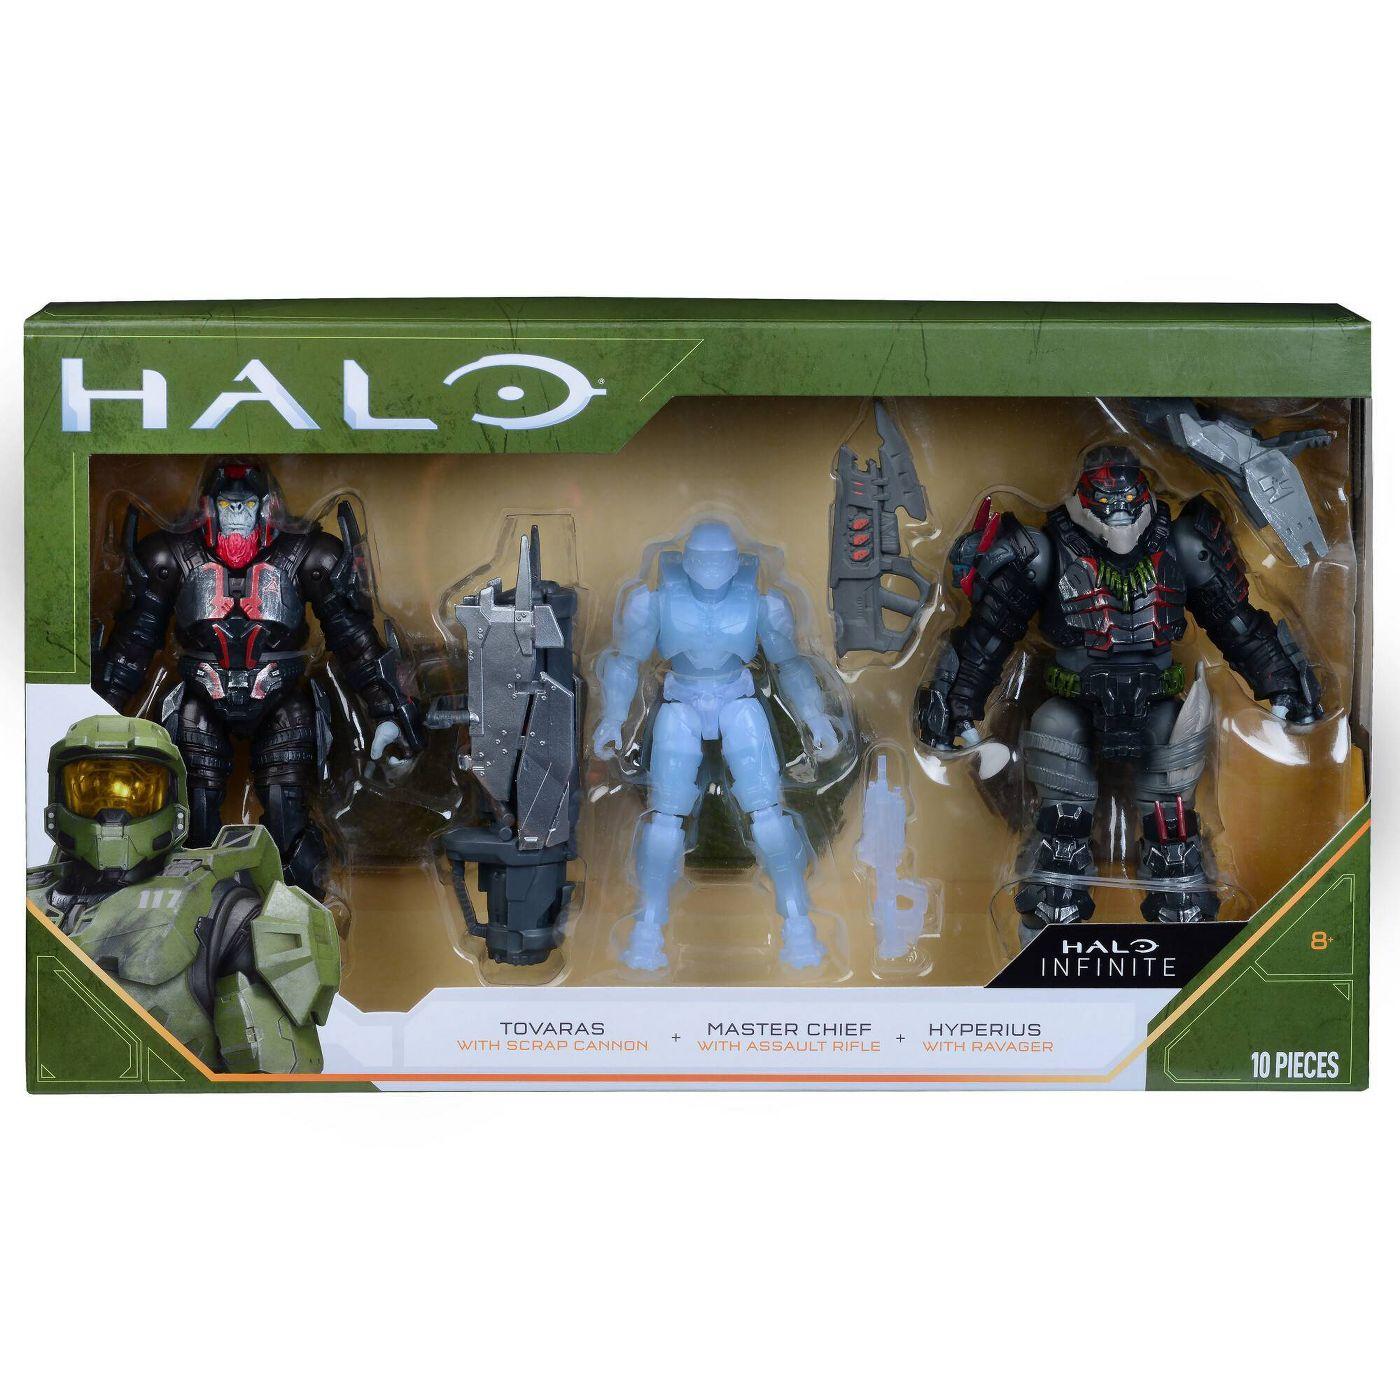 World of Halo Halo Infinite 3 Figure Pack画像